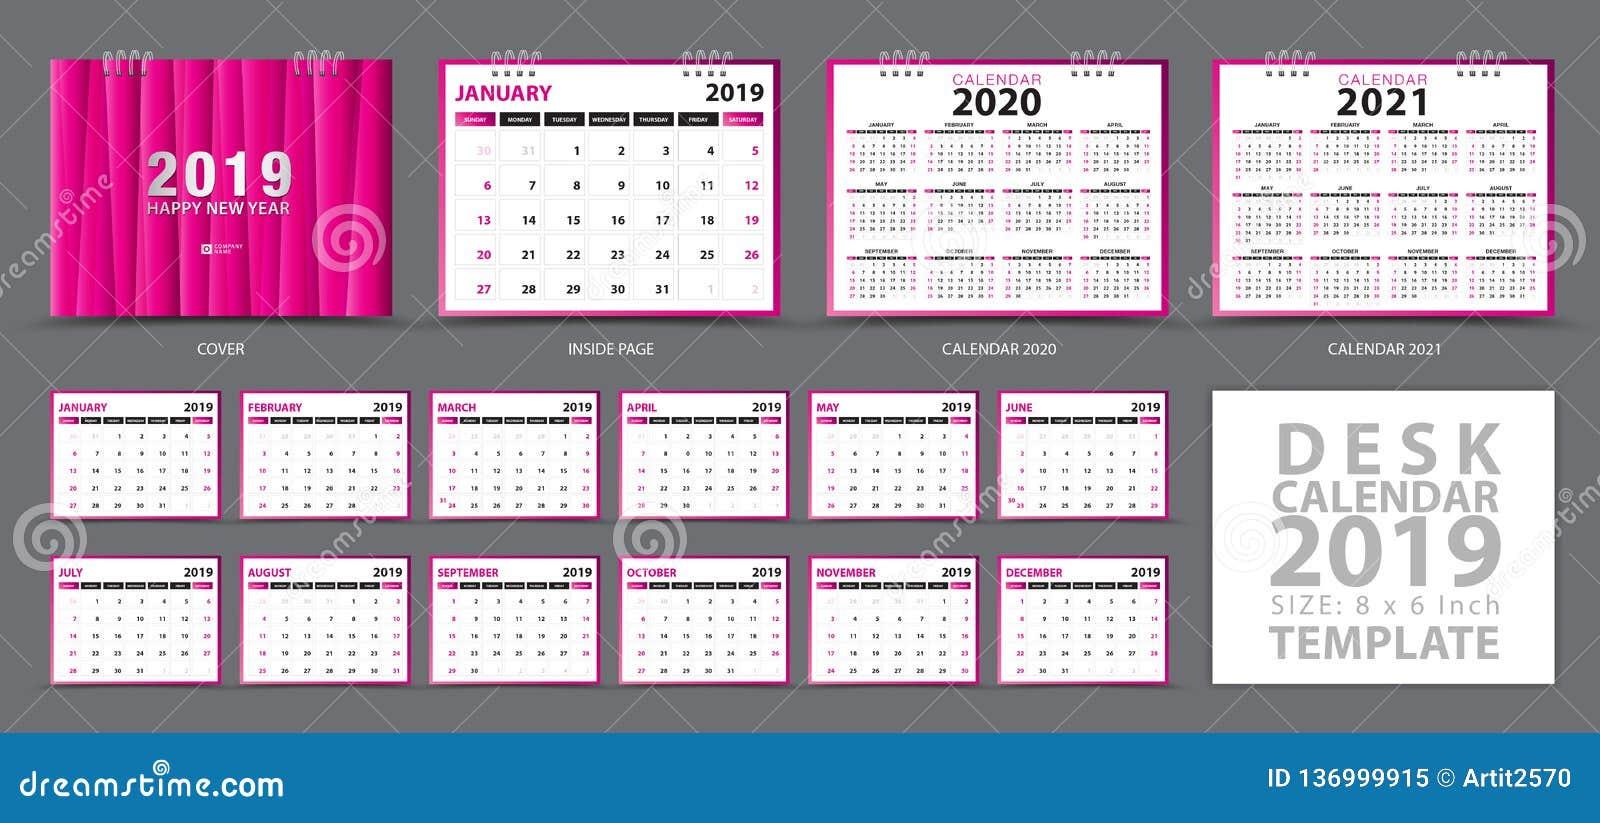 Biurko kalendarza 2019 szablon, set 12 miesiąca, kalendarz 2019, 2020, 2021 grafika